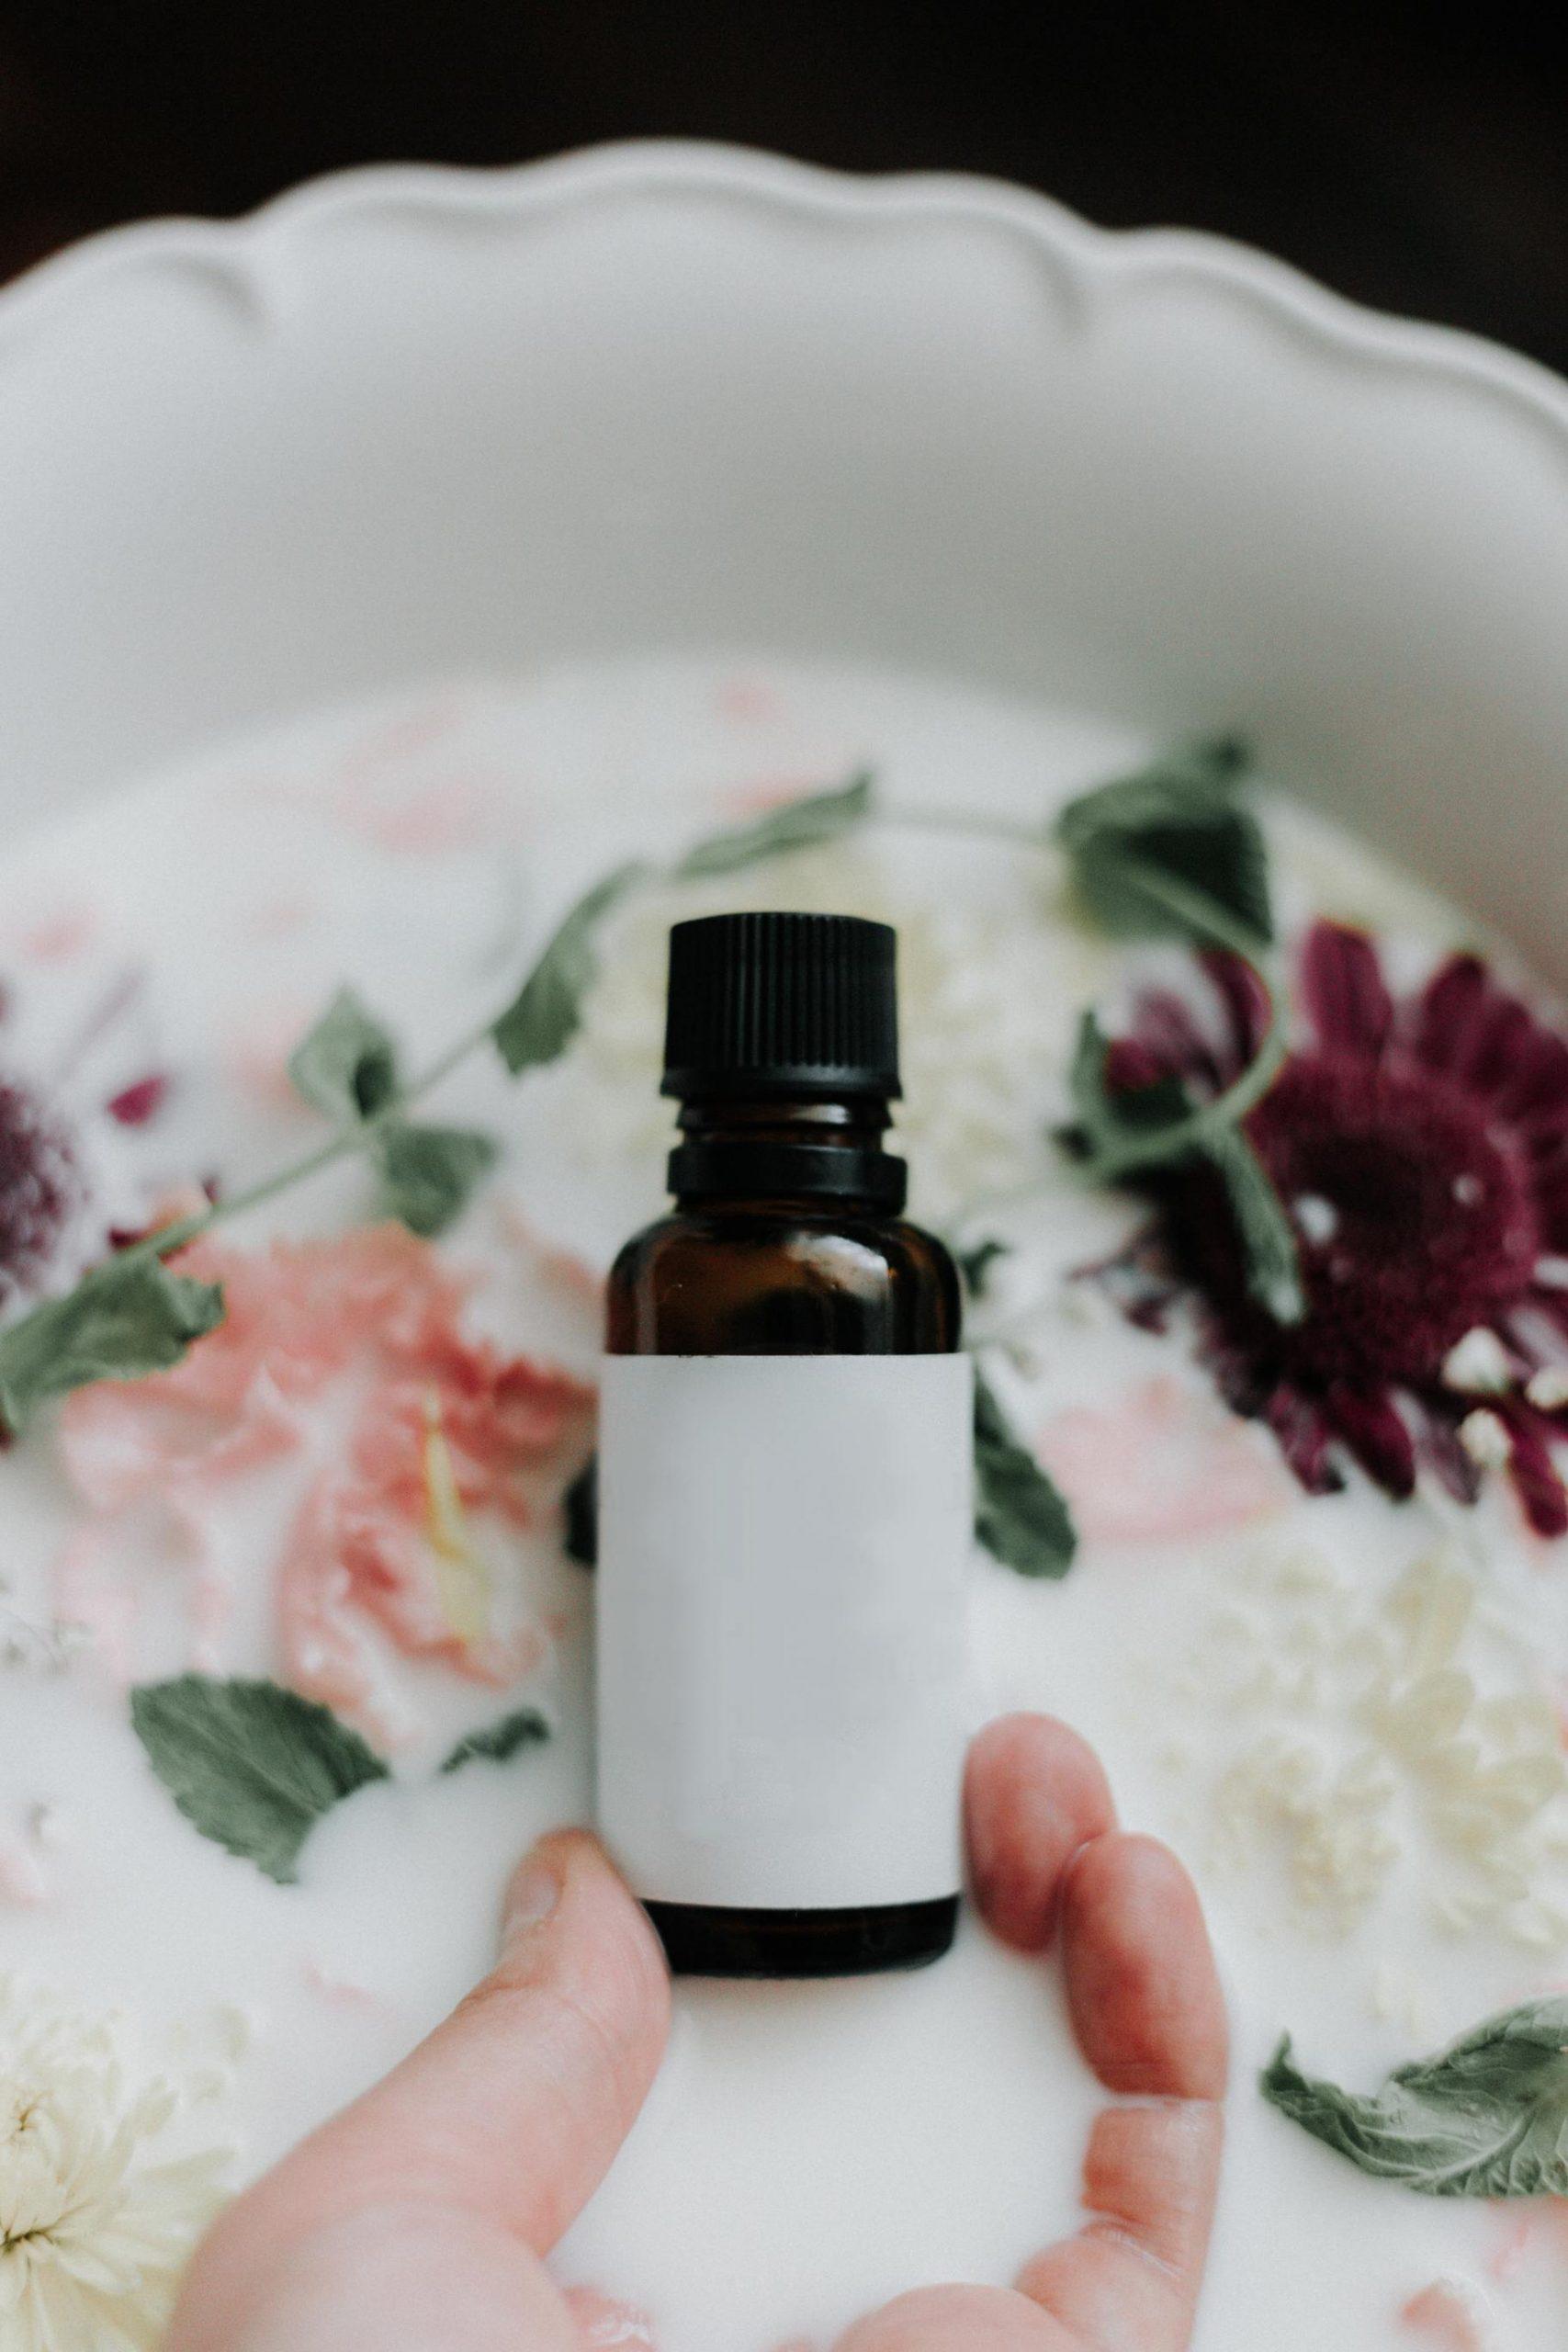 rosehip oil benefits for skin